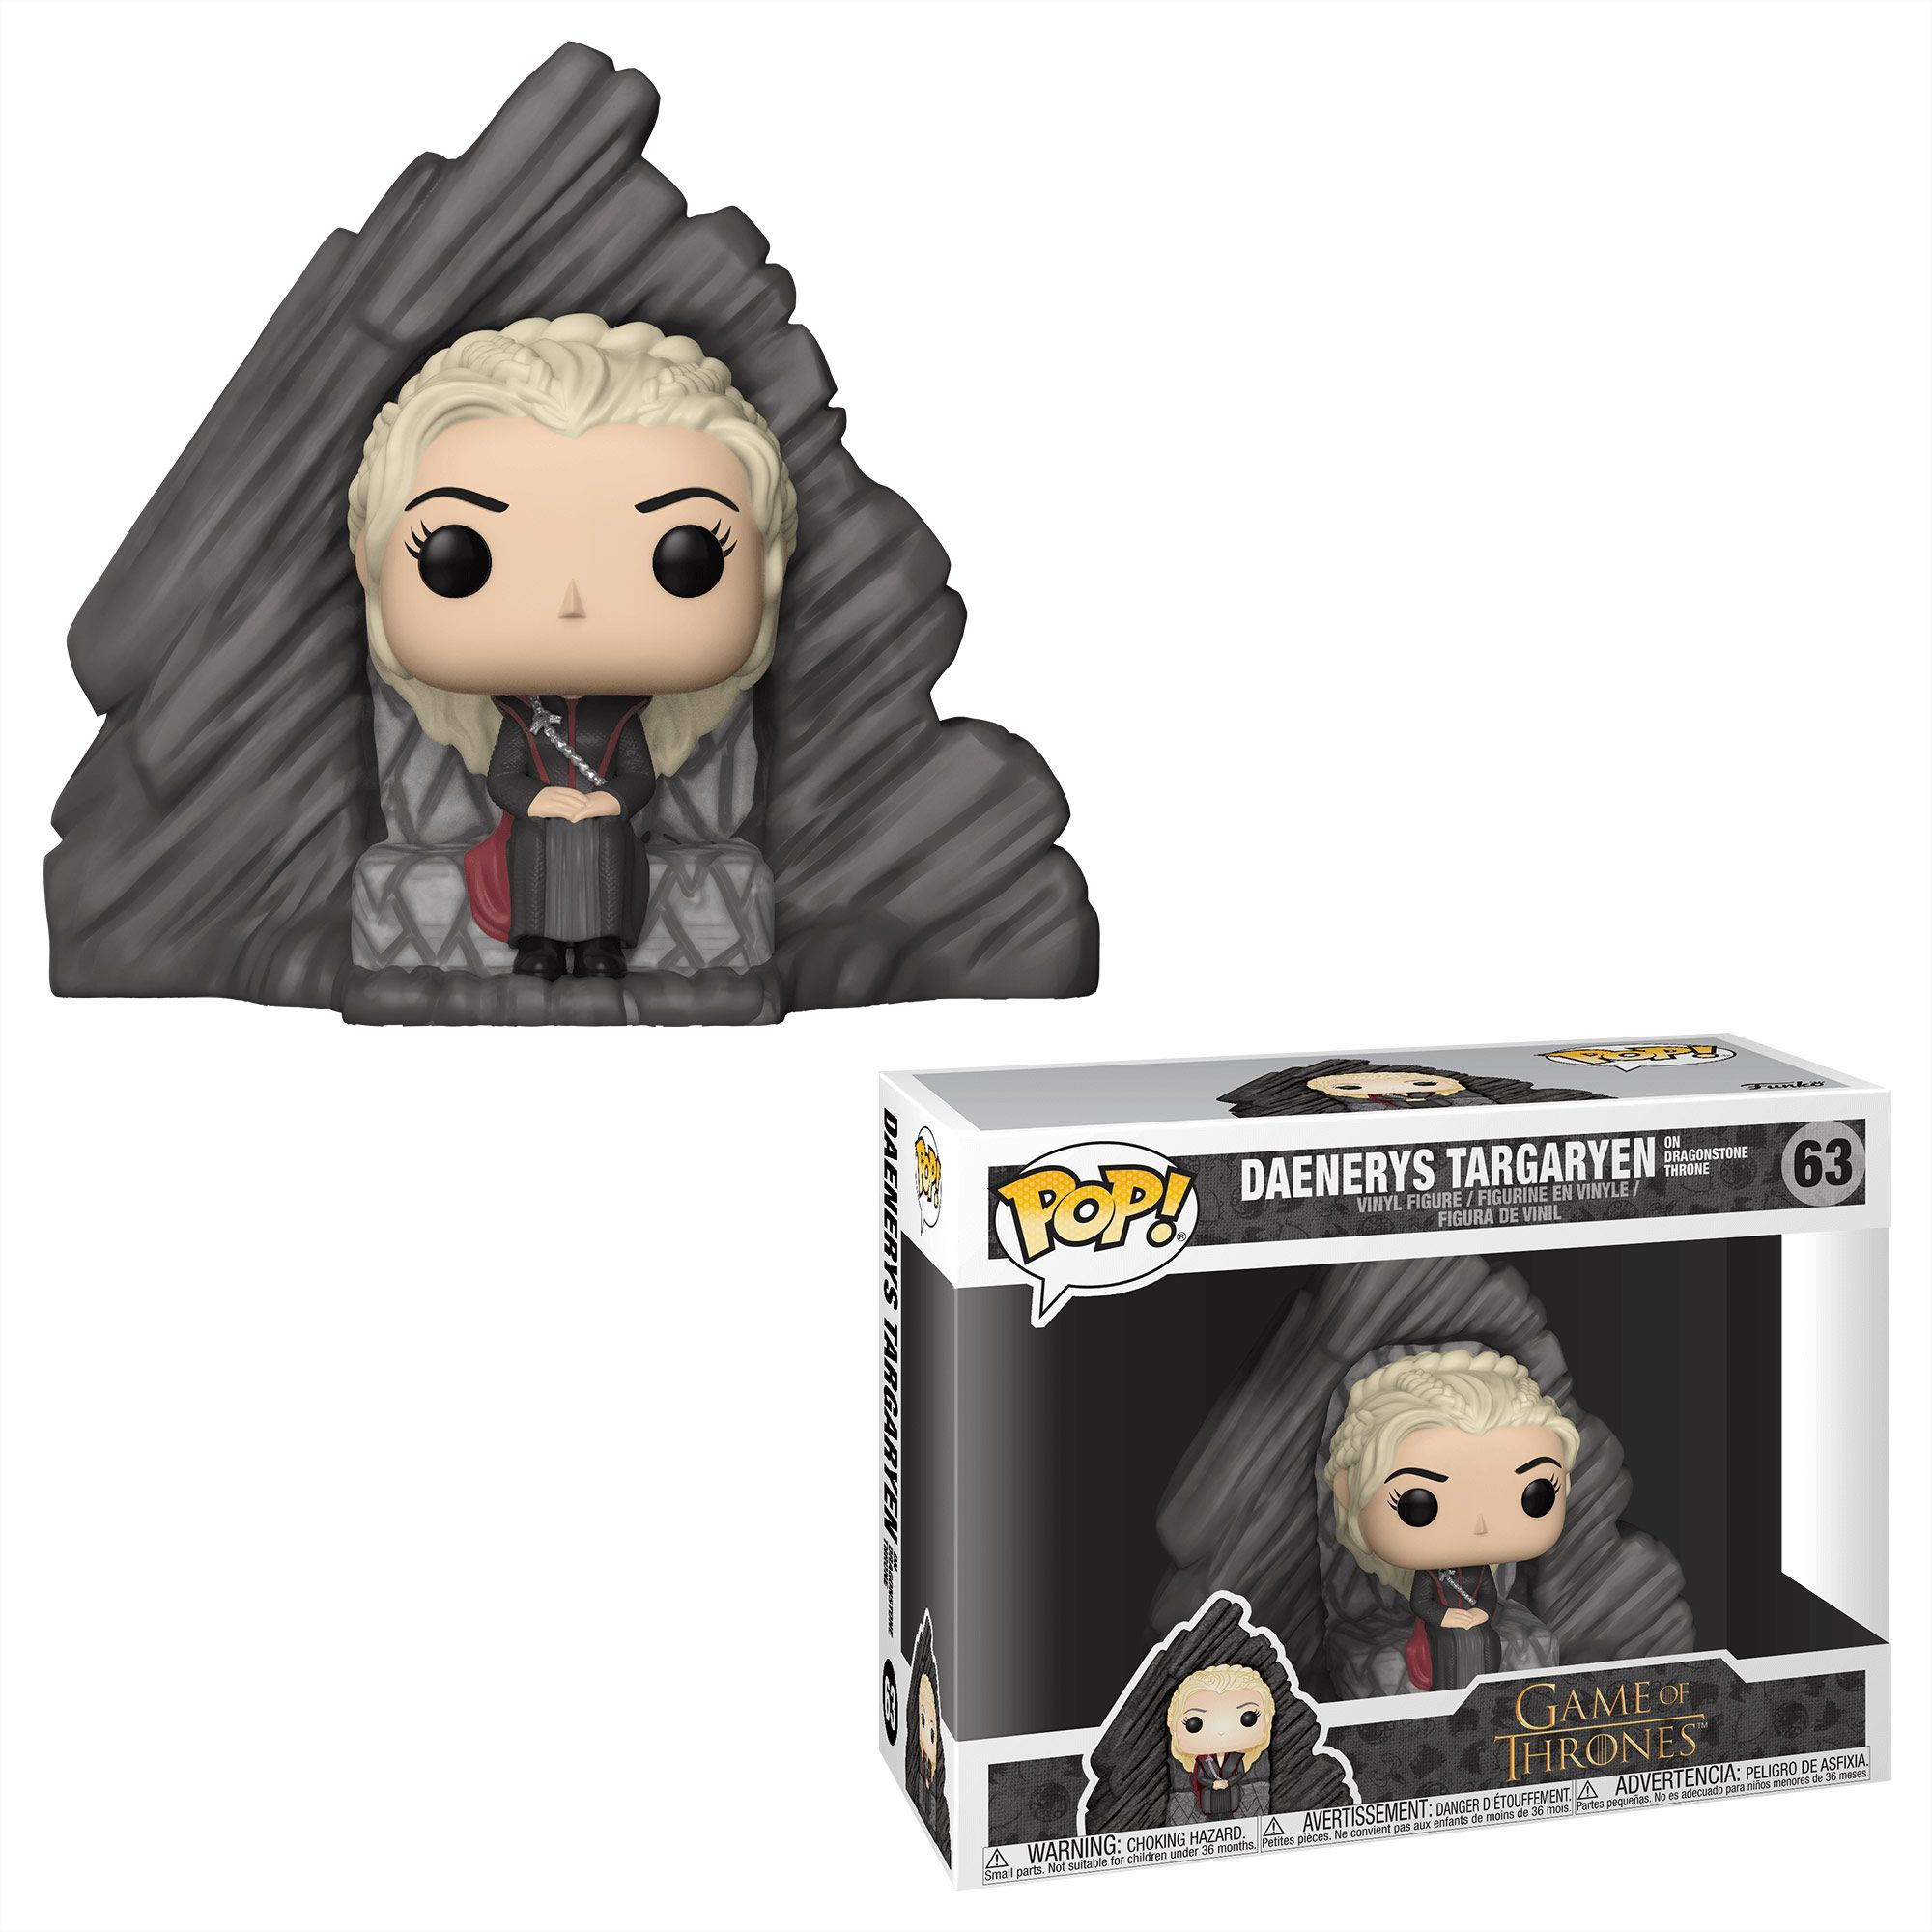 Daenerys Targaryen on Dragonstone Throne #63 - Game of Thrones - Funko Pop!